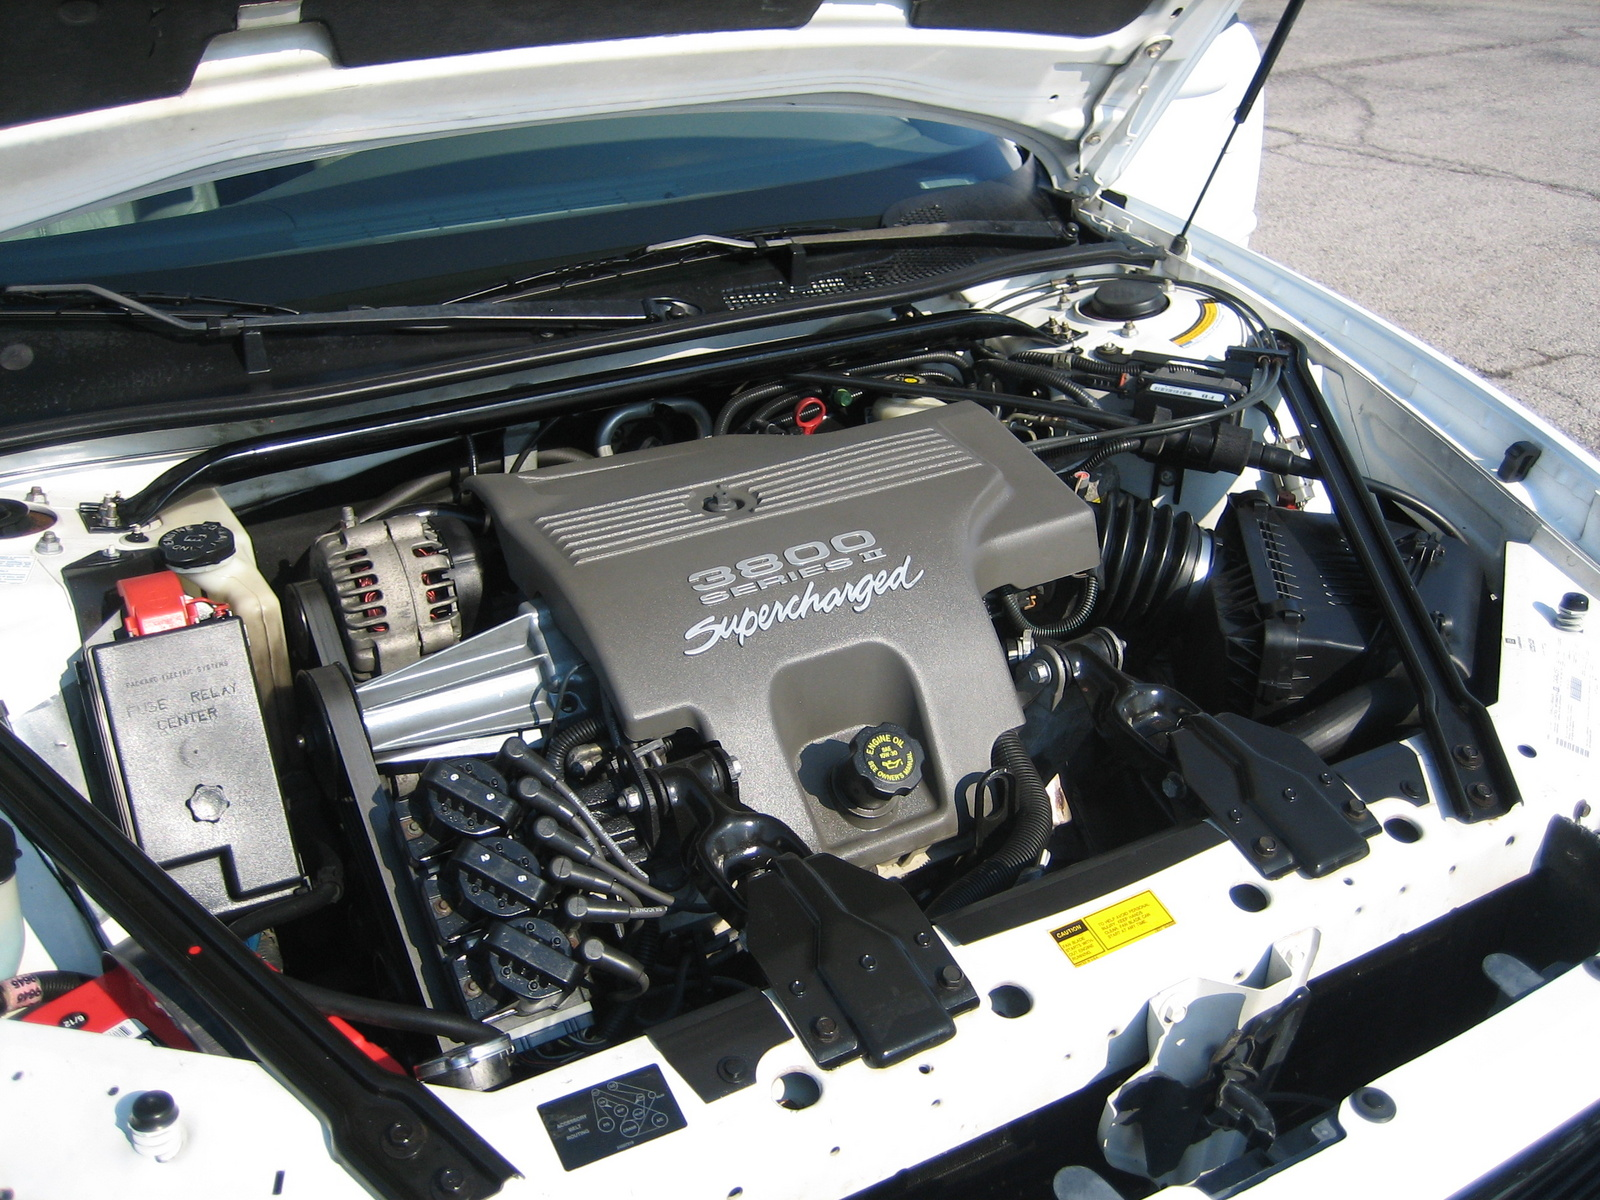 Buick Regal Dr Gs Supercharged Sedan Pic on 2000 Buick Lesabre Serpentine Belt Diagram